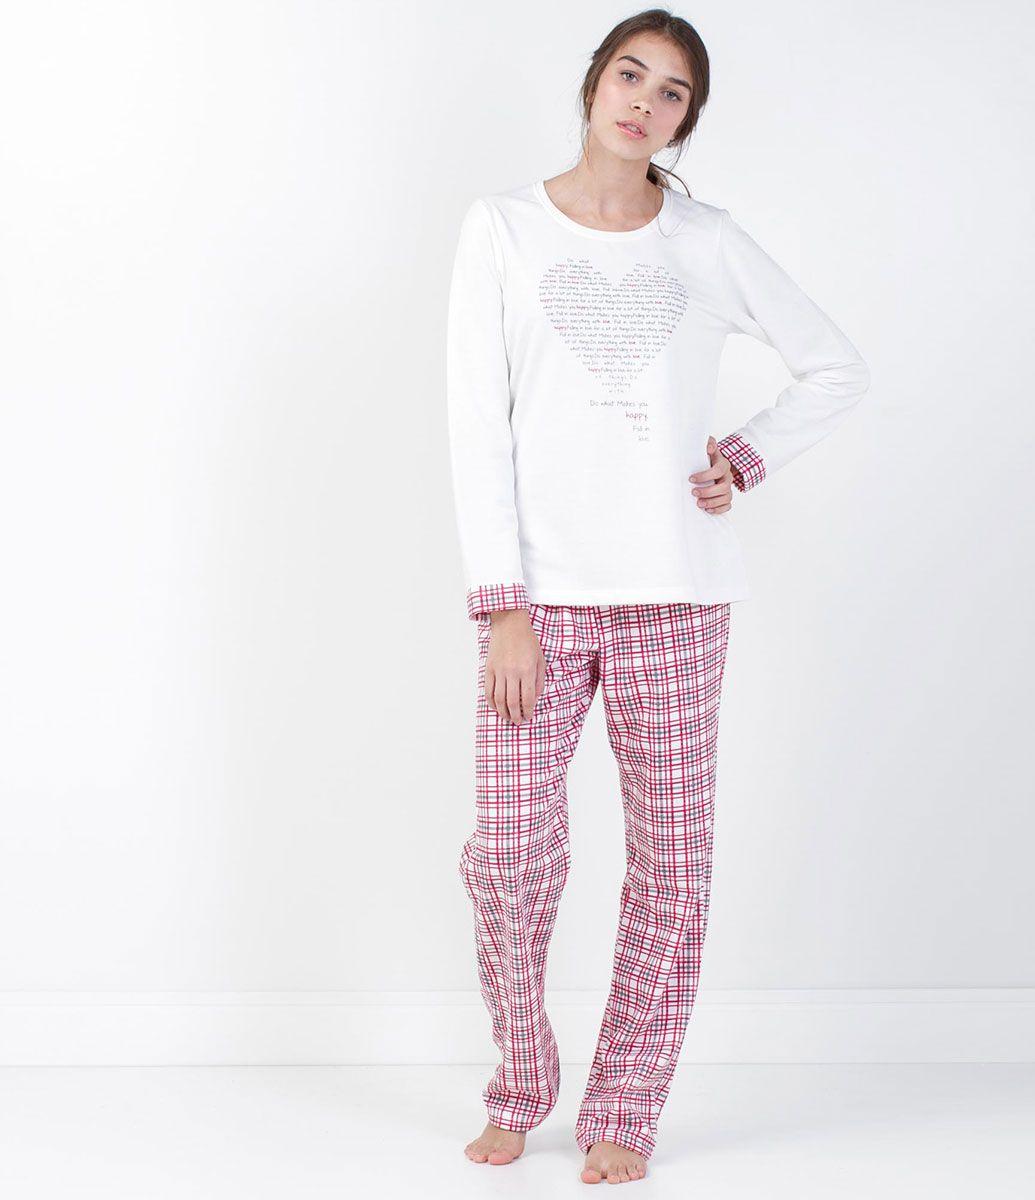 c18f64c737 Pijama Feminino Moletinho + Calça Xadrez - Lojas Renner